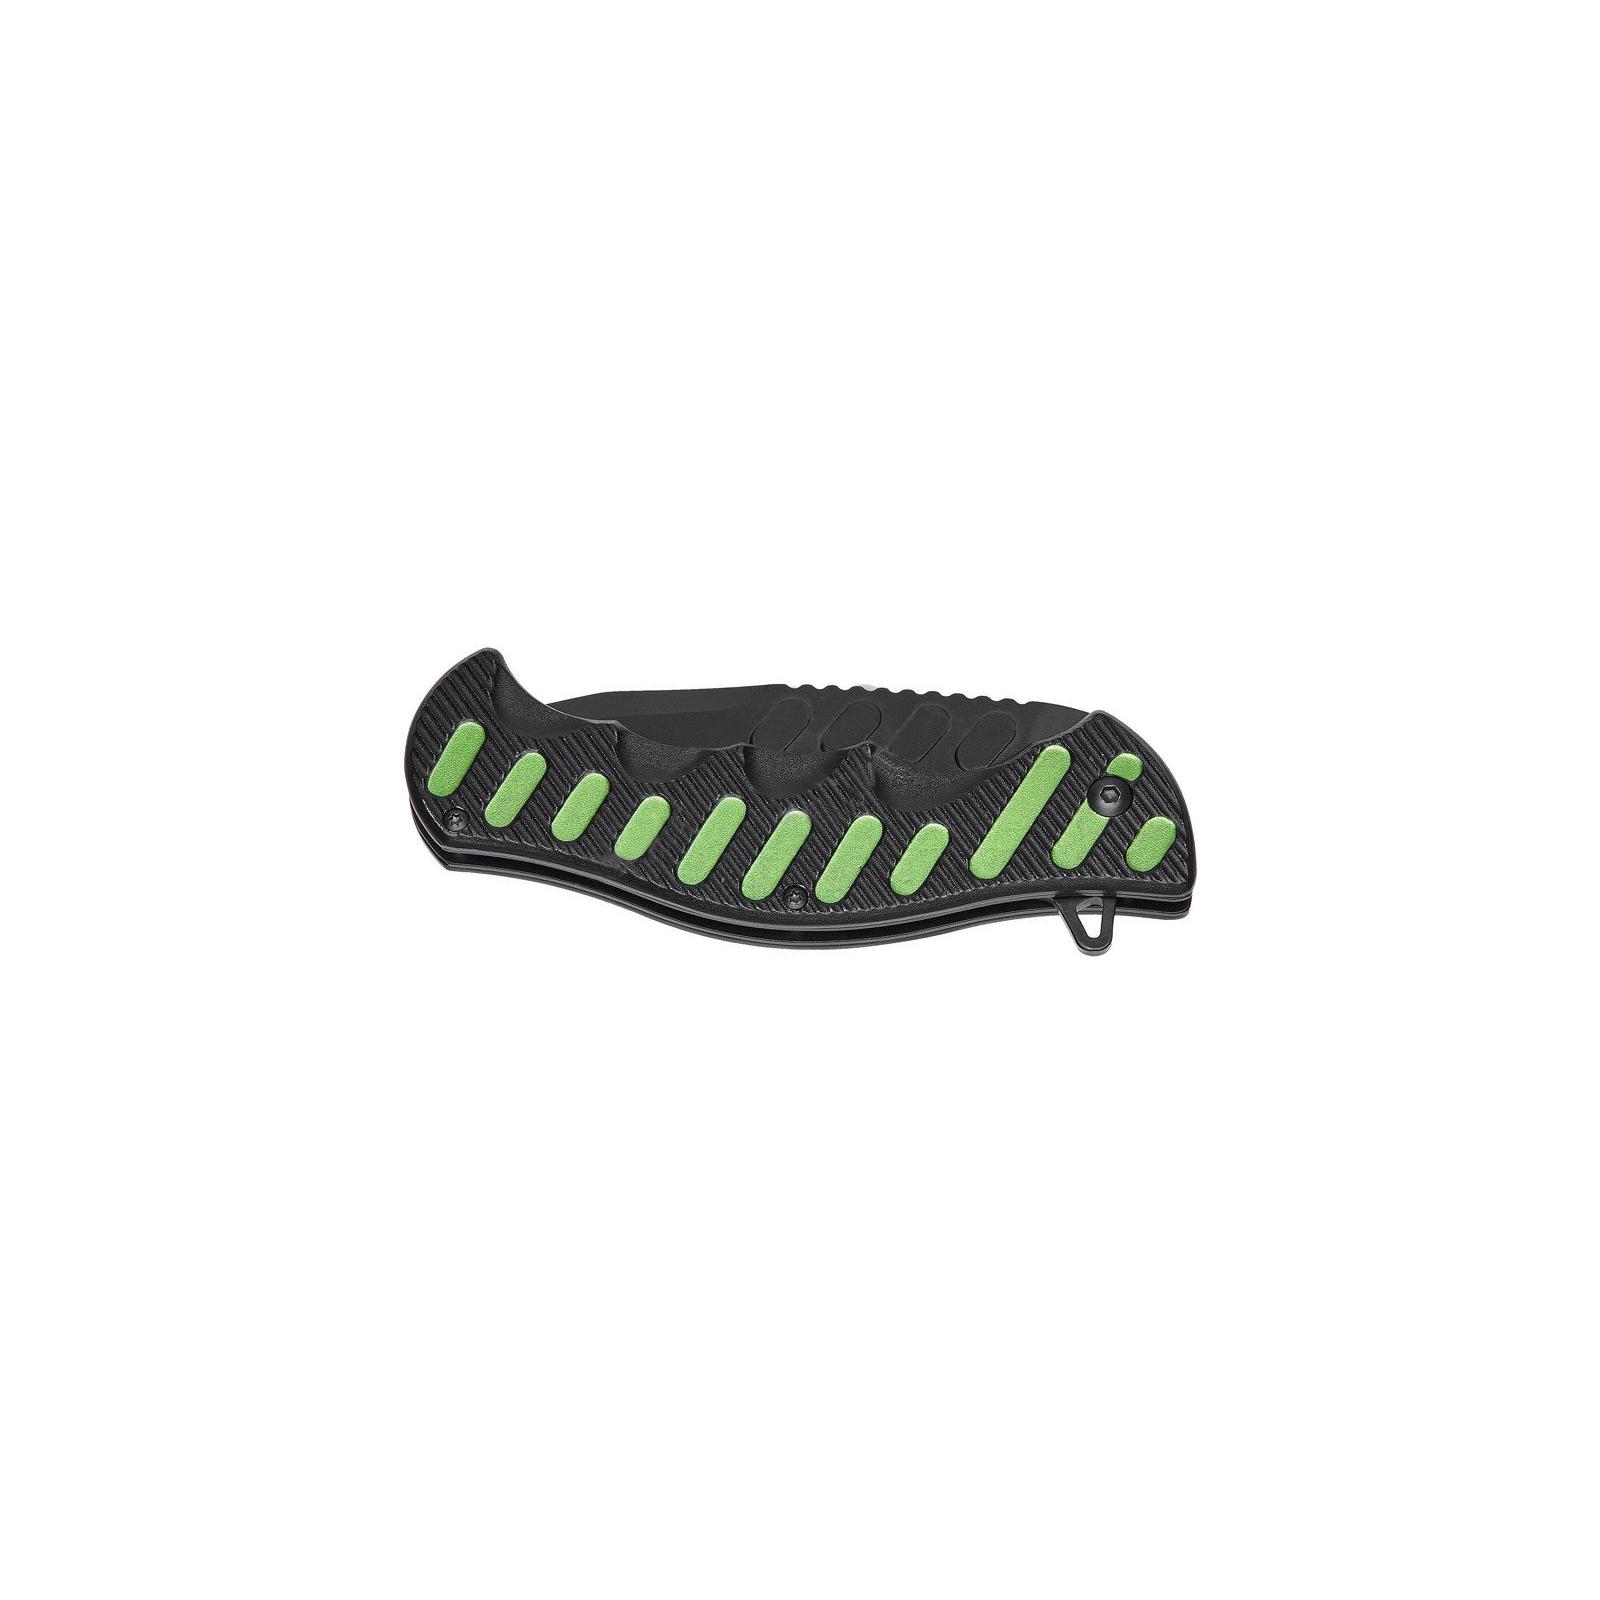 Нож Skif Plus Funster Black/Green (H-K2010053BGR) изображение 3